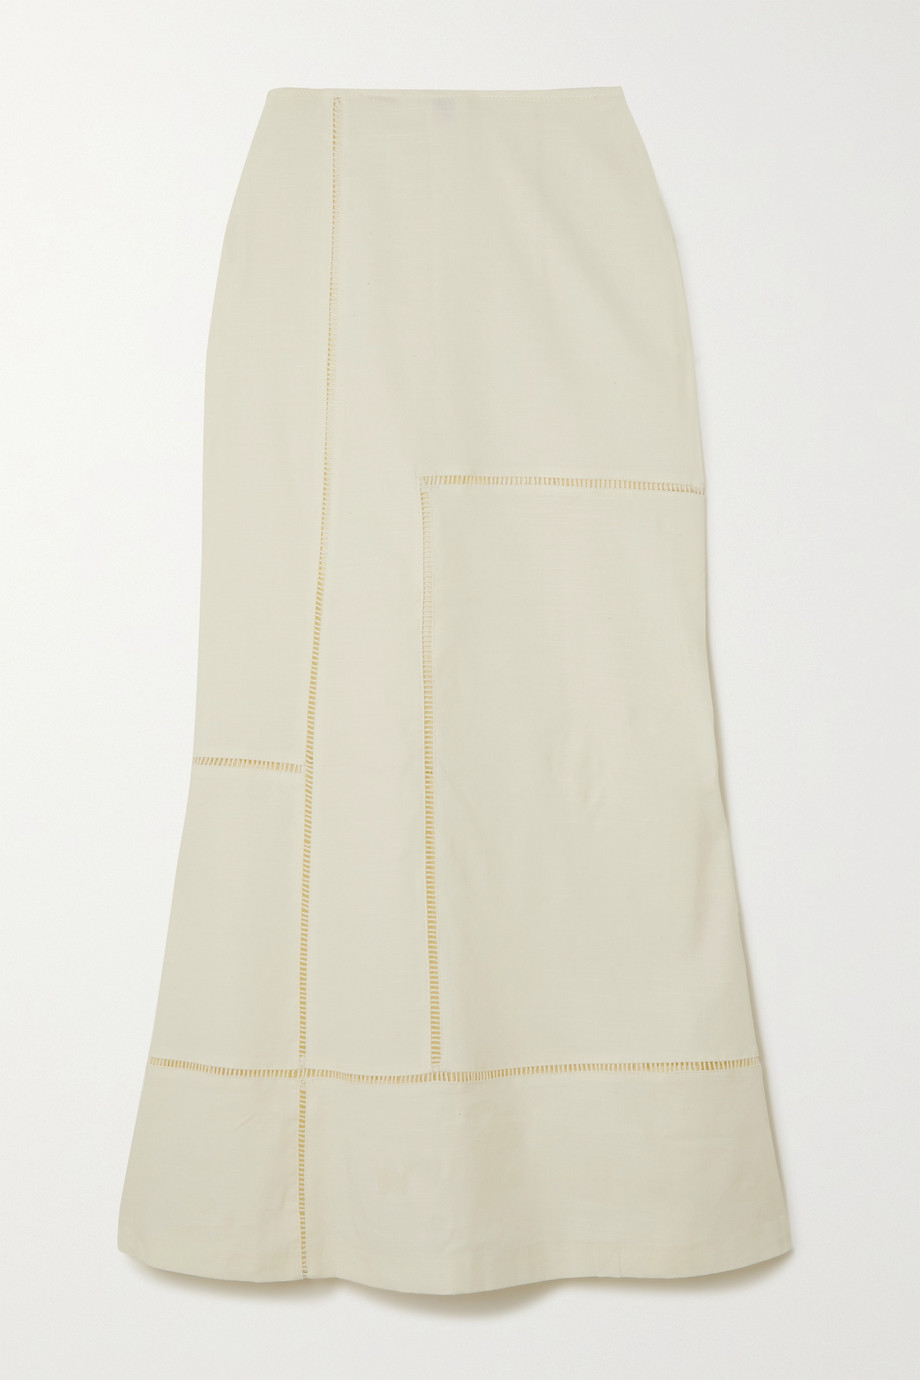 Cult Gaia Candice cutout linen-blend midi skirt